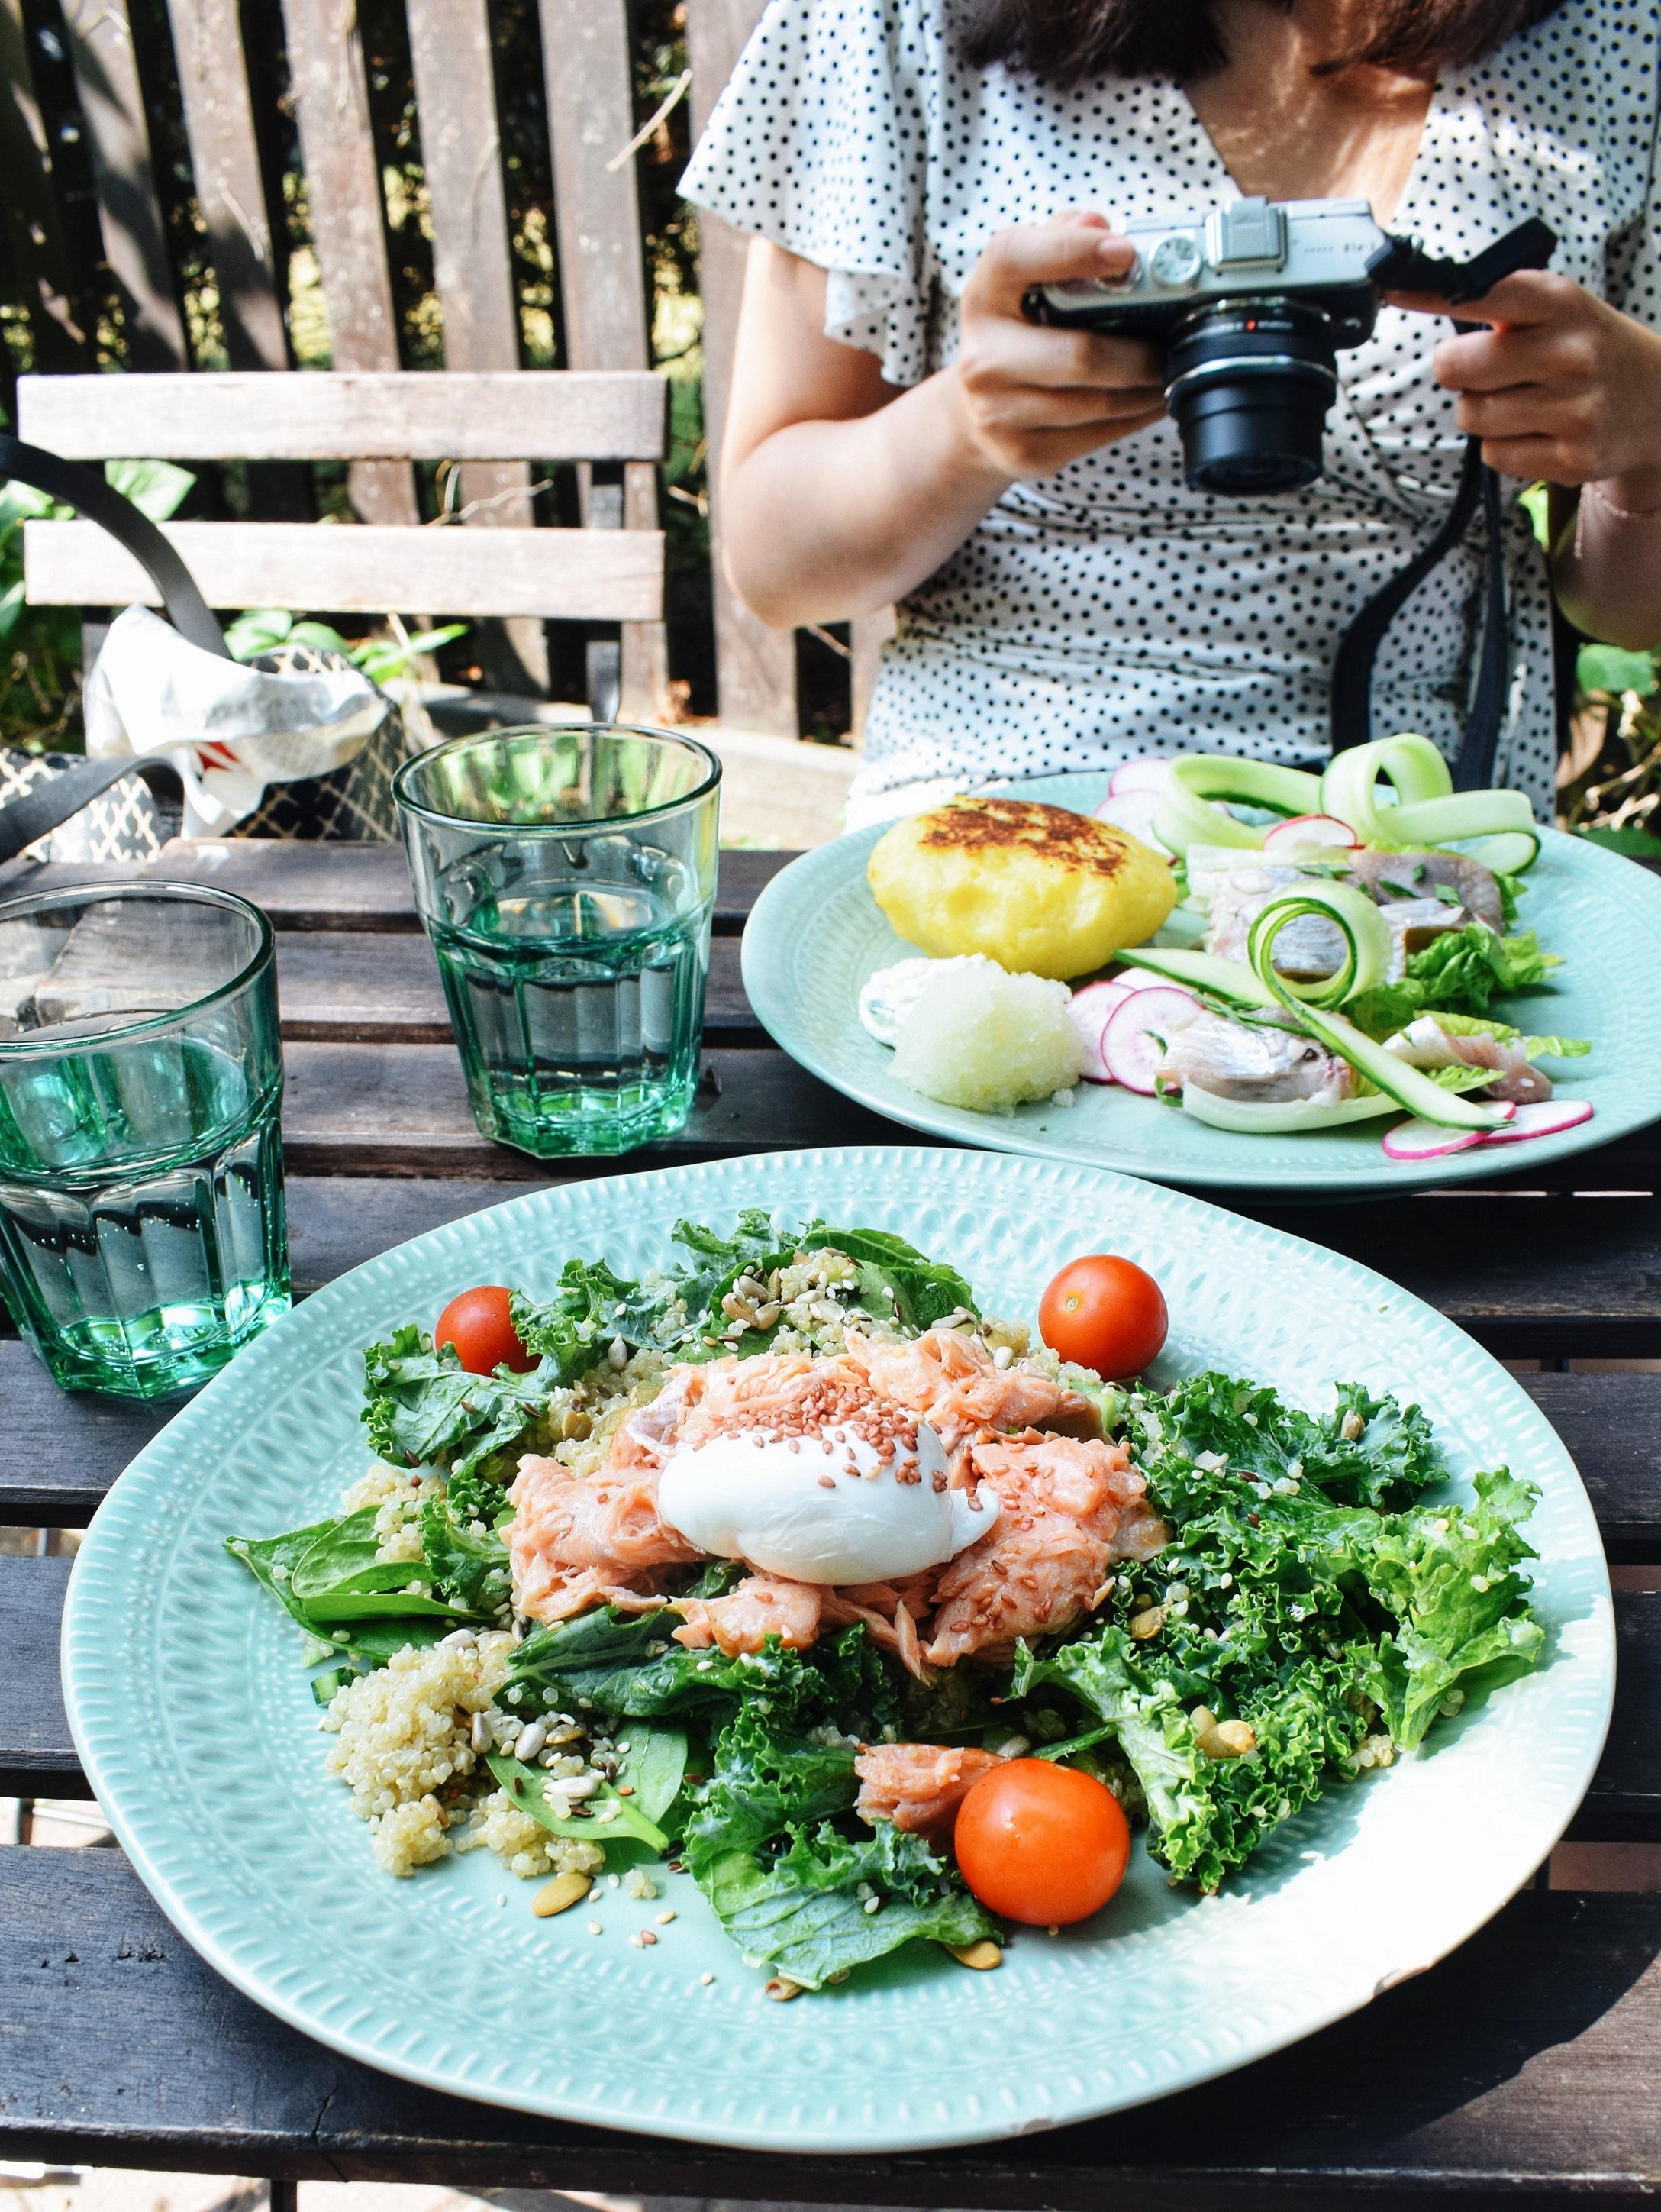 Outlandish blog relationship food photography challenge favourite restaurant Tallinn Estonia